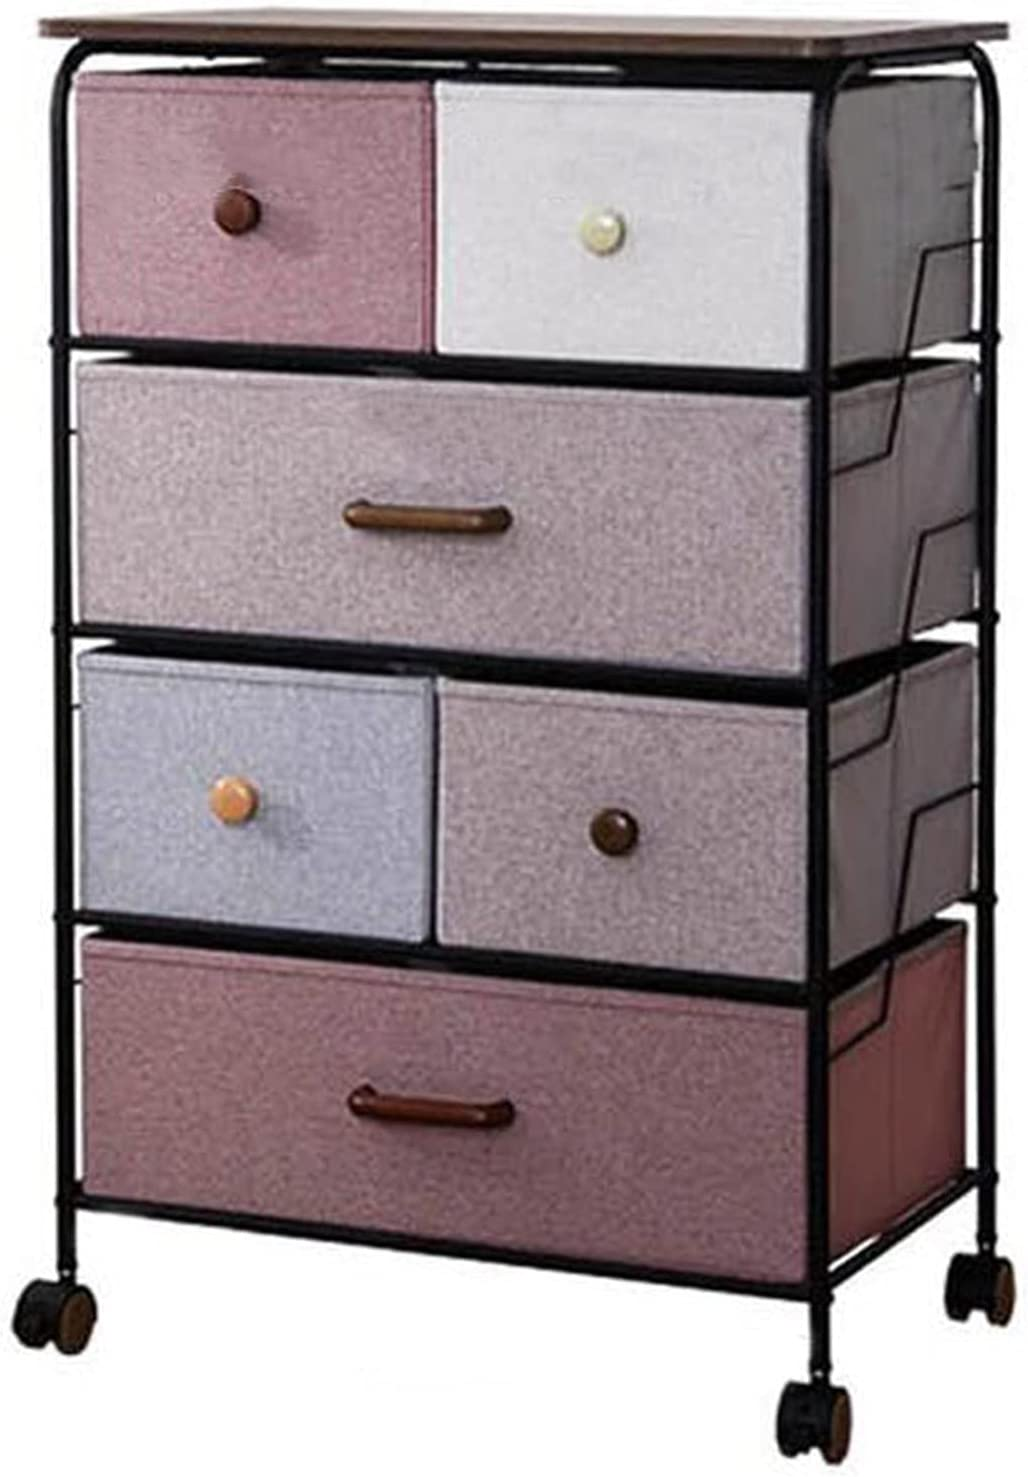 ACD Fabric Dresser for Choice Organizer Bedroom Japan Maker New Drawer